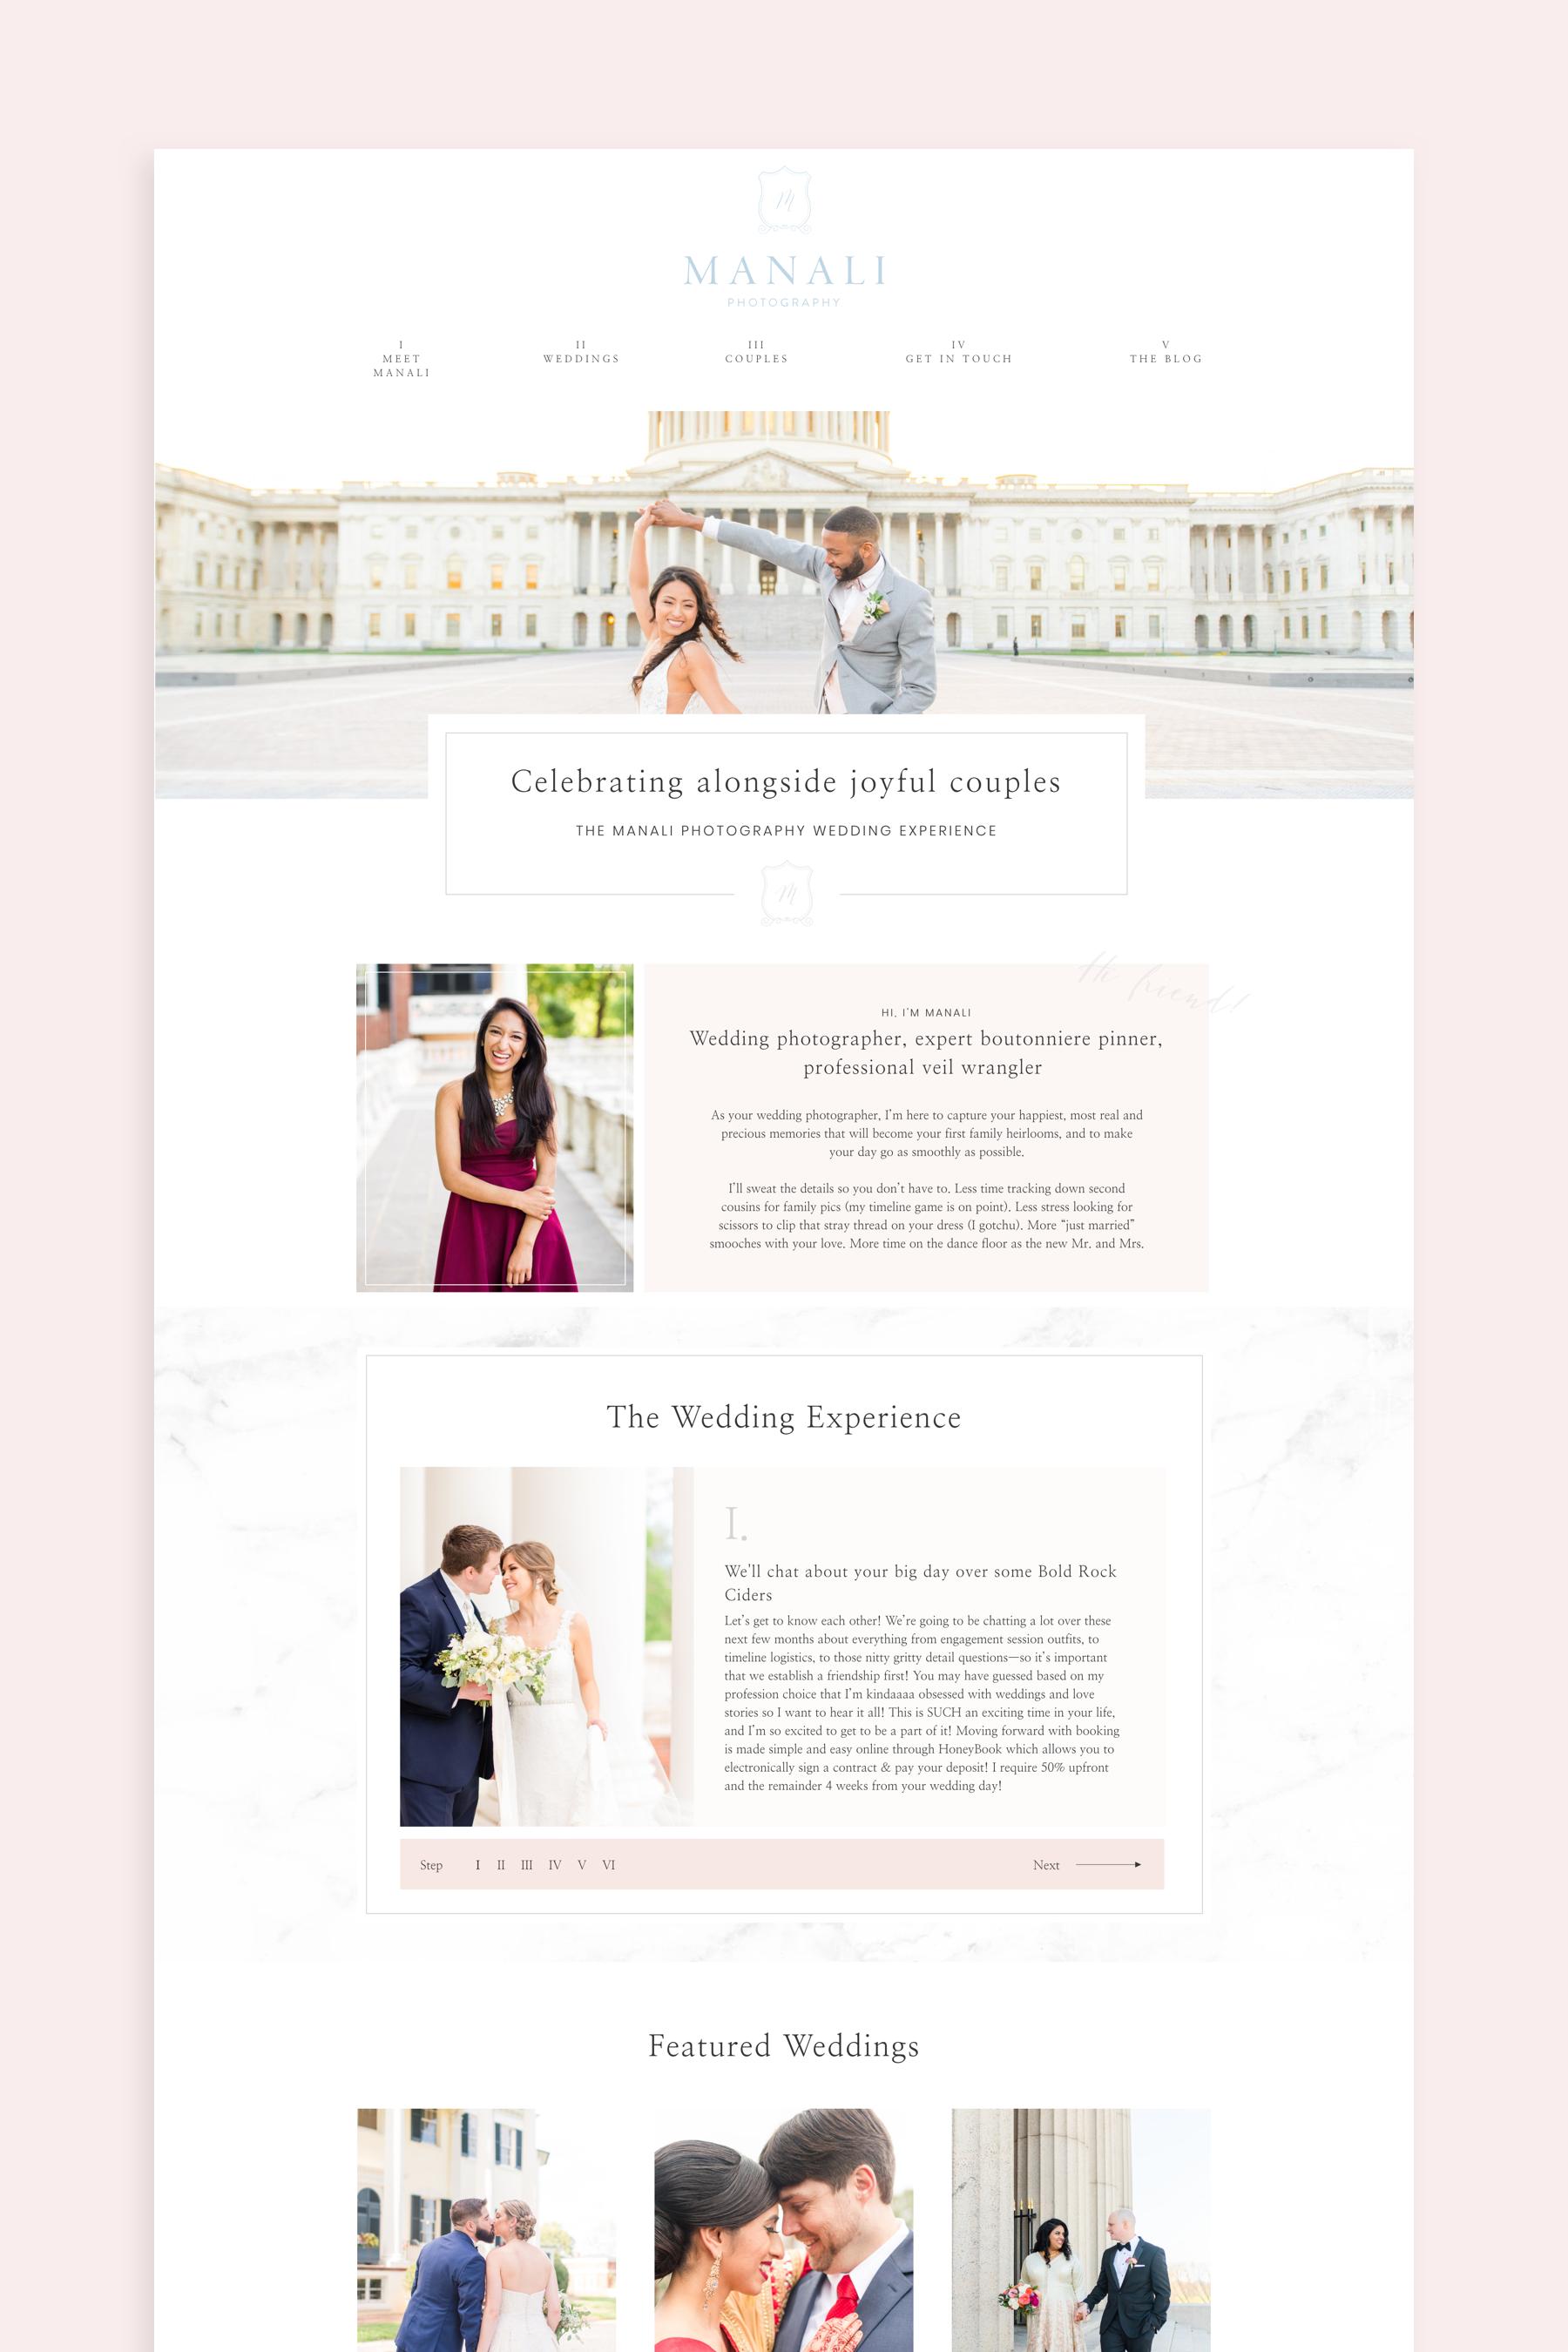 Custom Showit Web Page For Virginia Wedding Photographer Showit Webdesign Customwebsit Virginia Wedding Photographer Wedding Professional Virginia Weddings